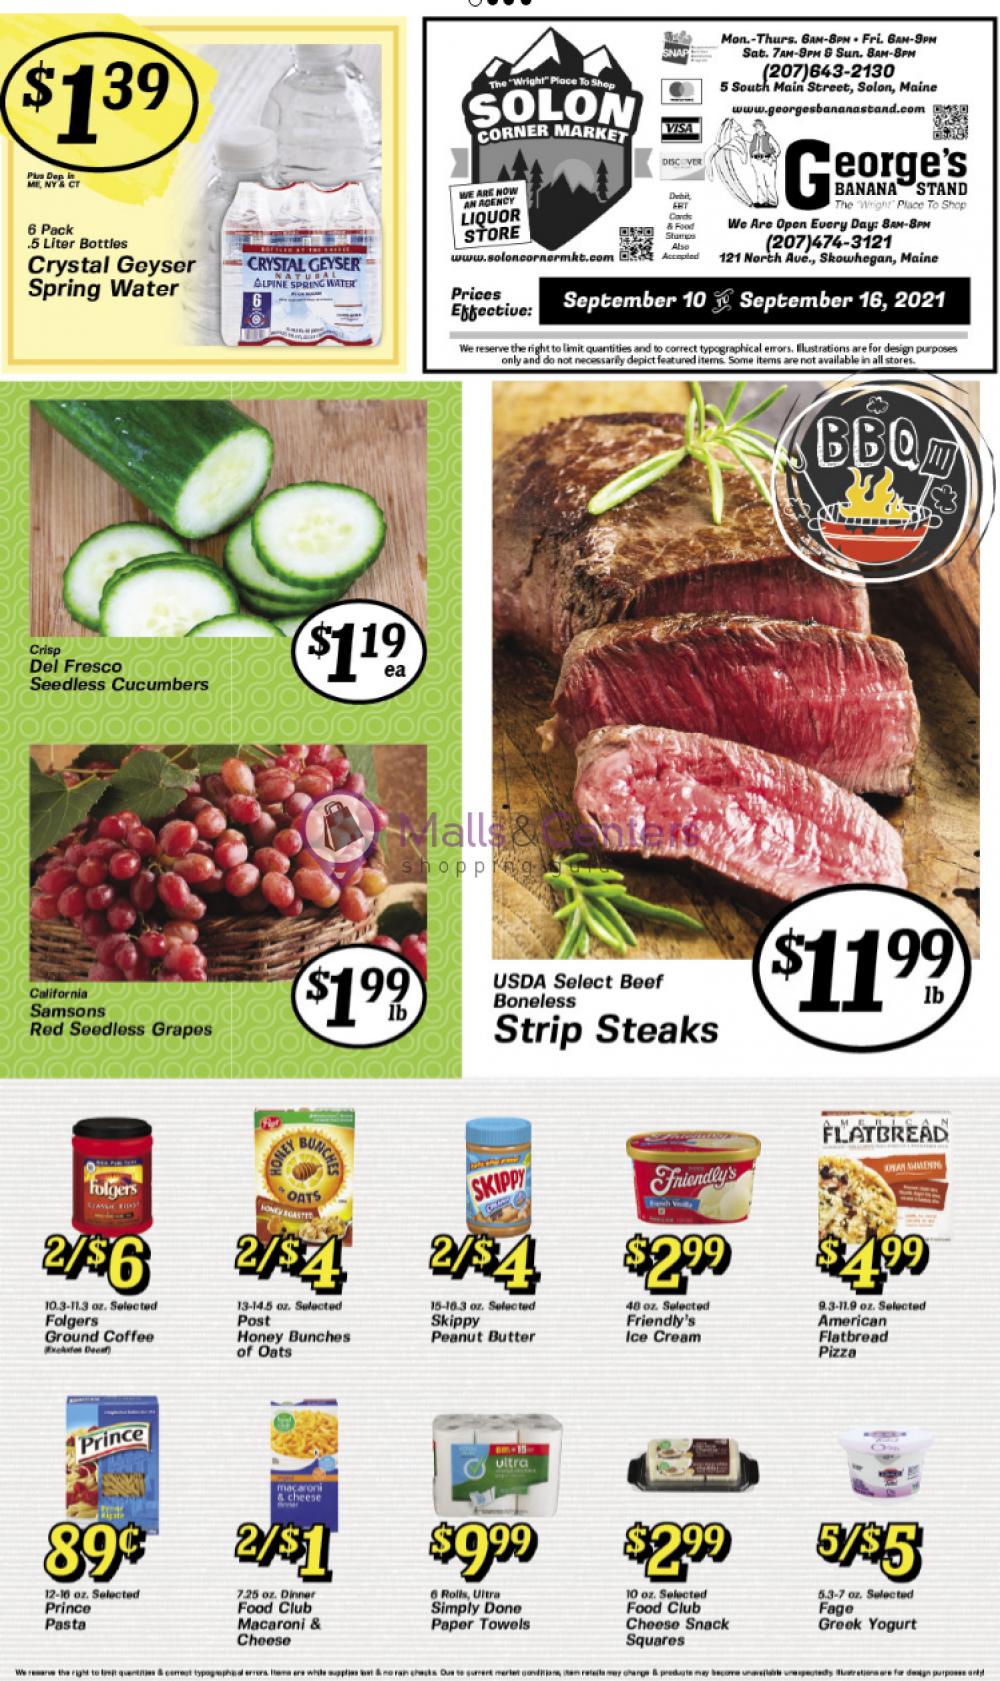 weekly ads Solon Corner market - page 1 - mallscenters.com